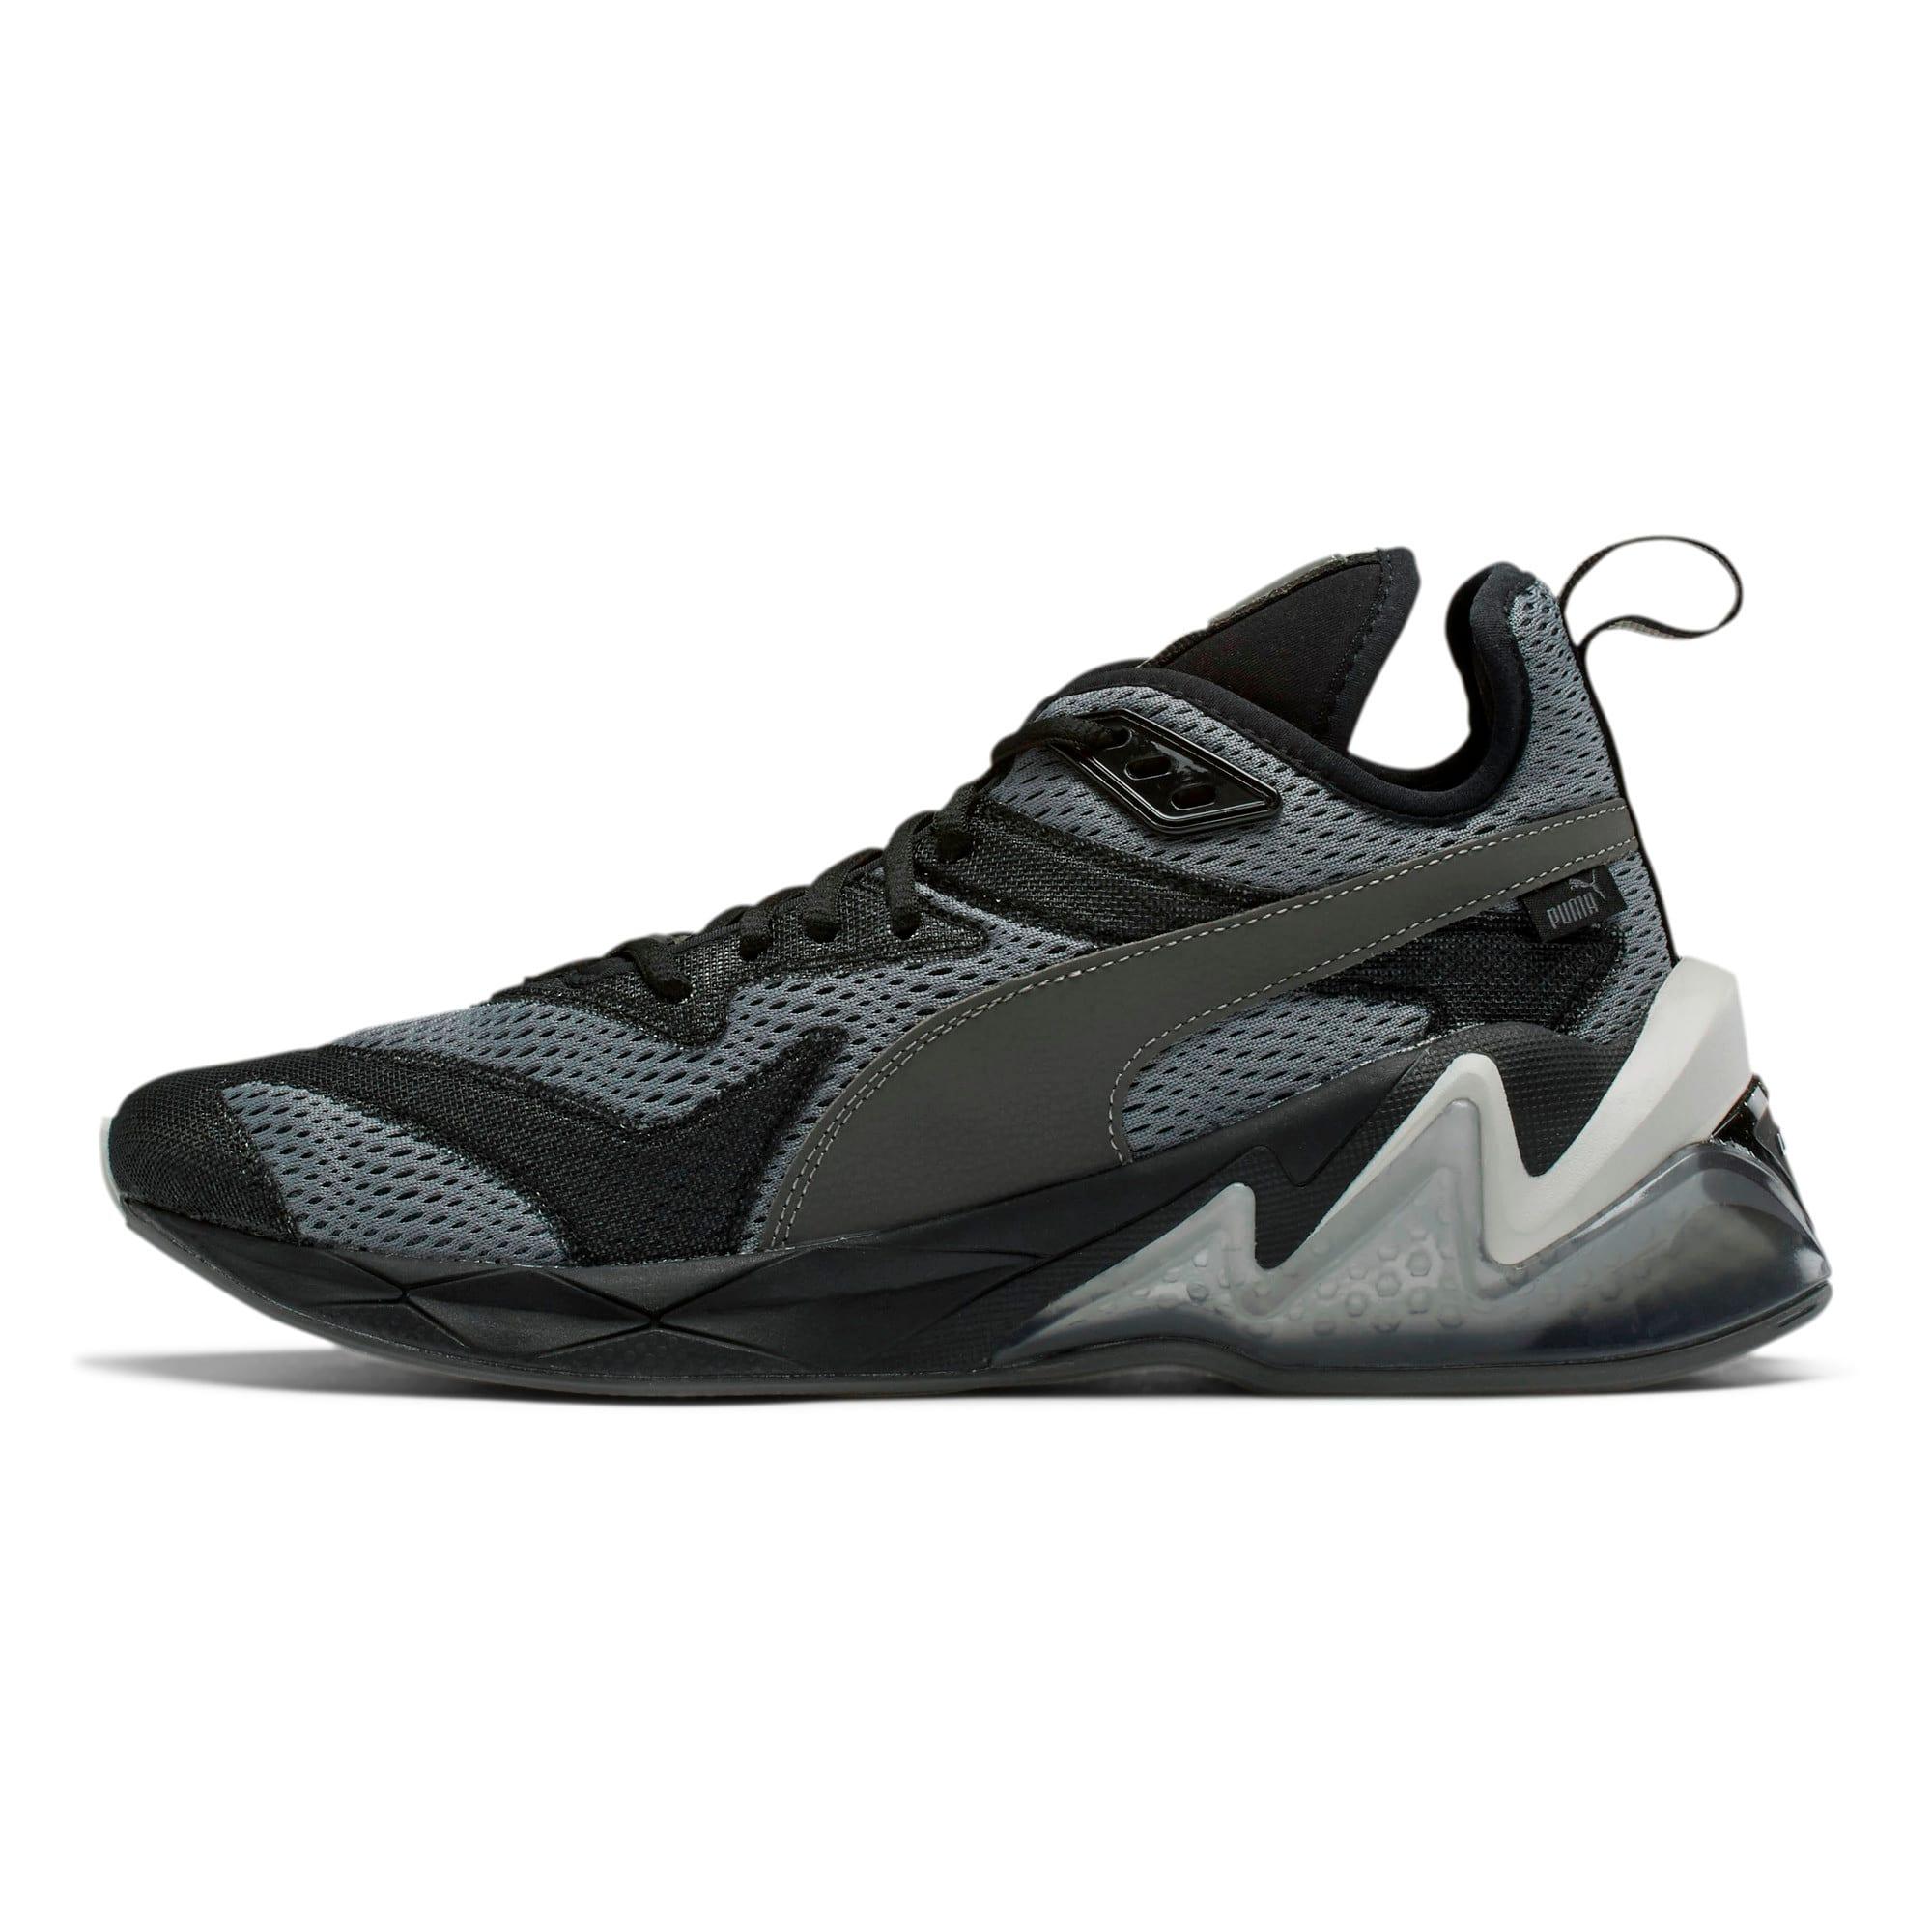 Thumbnail 1 of LQDCELL Origin Tech Men's Training Shoes, Puma Black-CASTLEROCK, medium